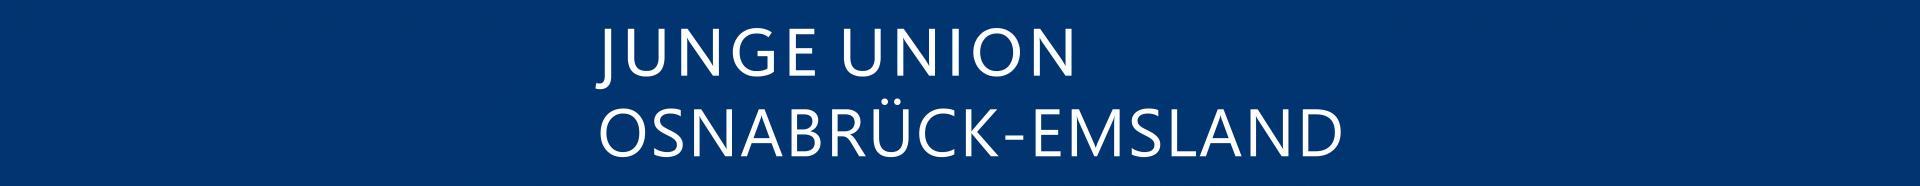 JU Osnabrück-Emsland Banner